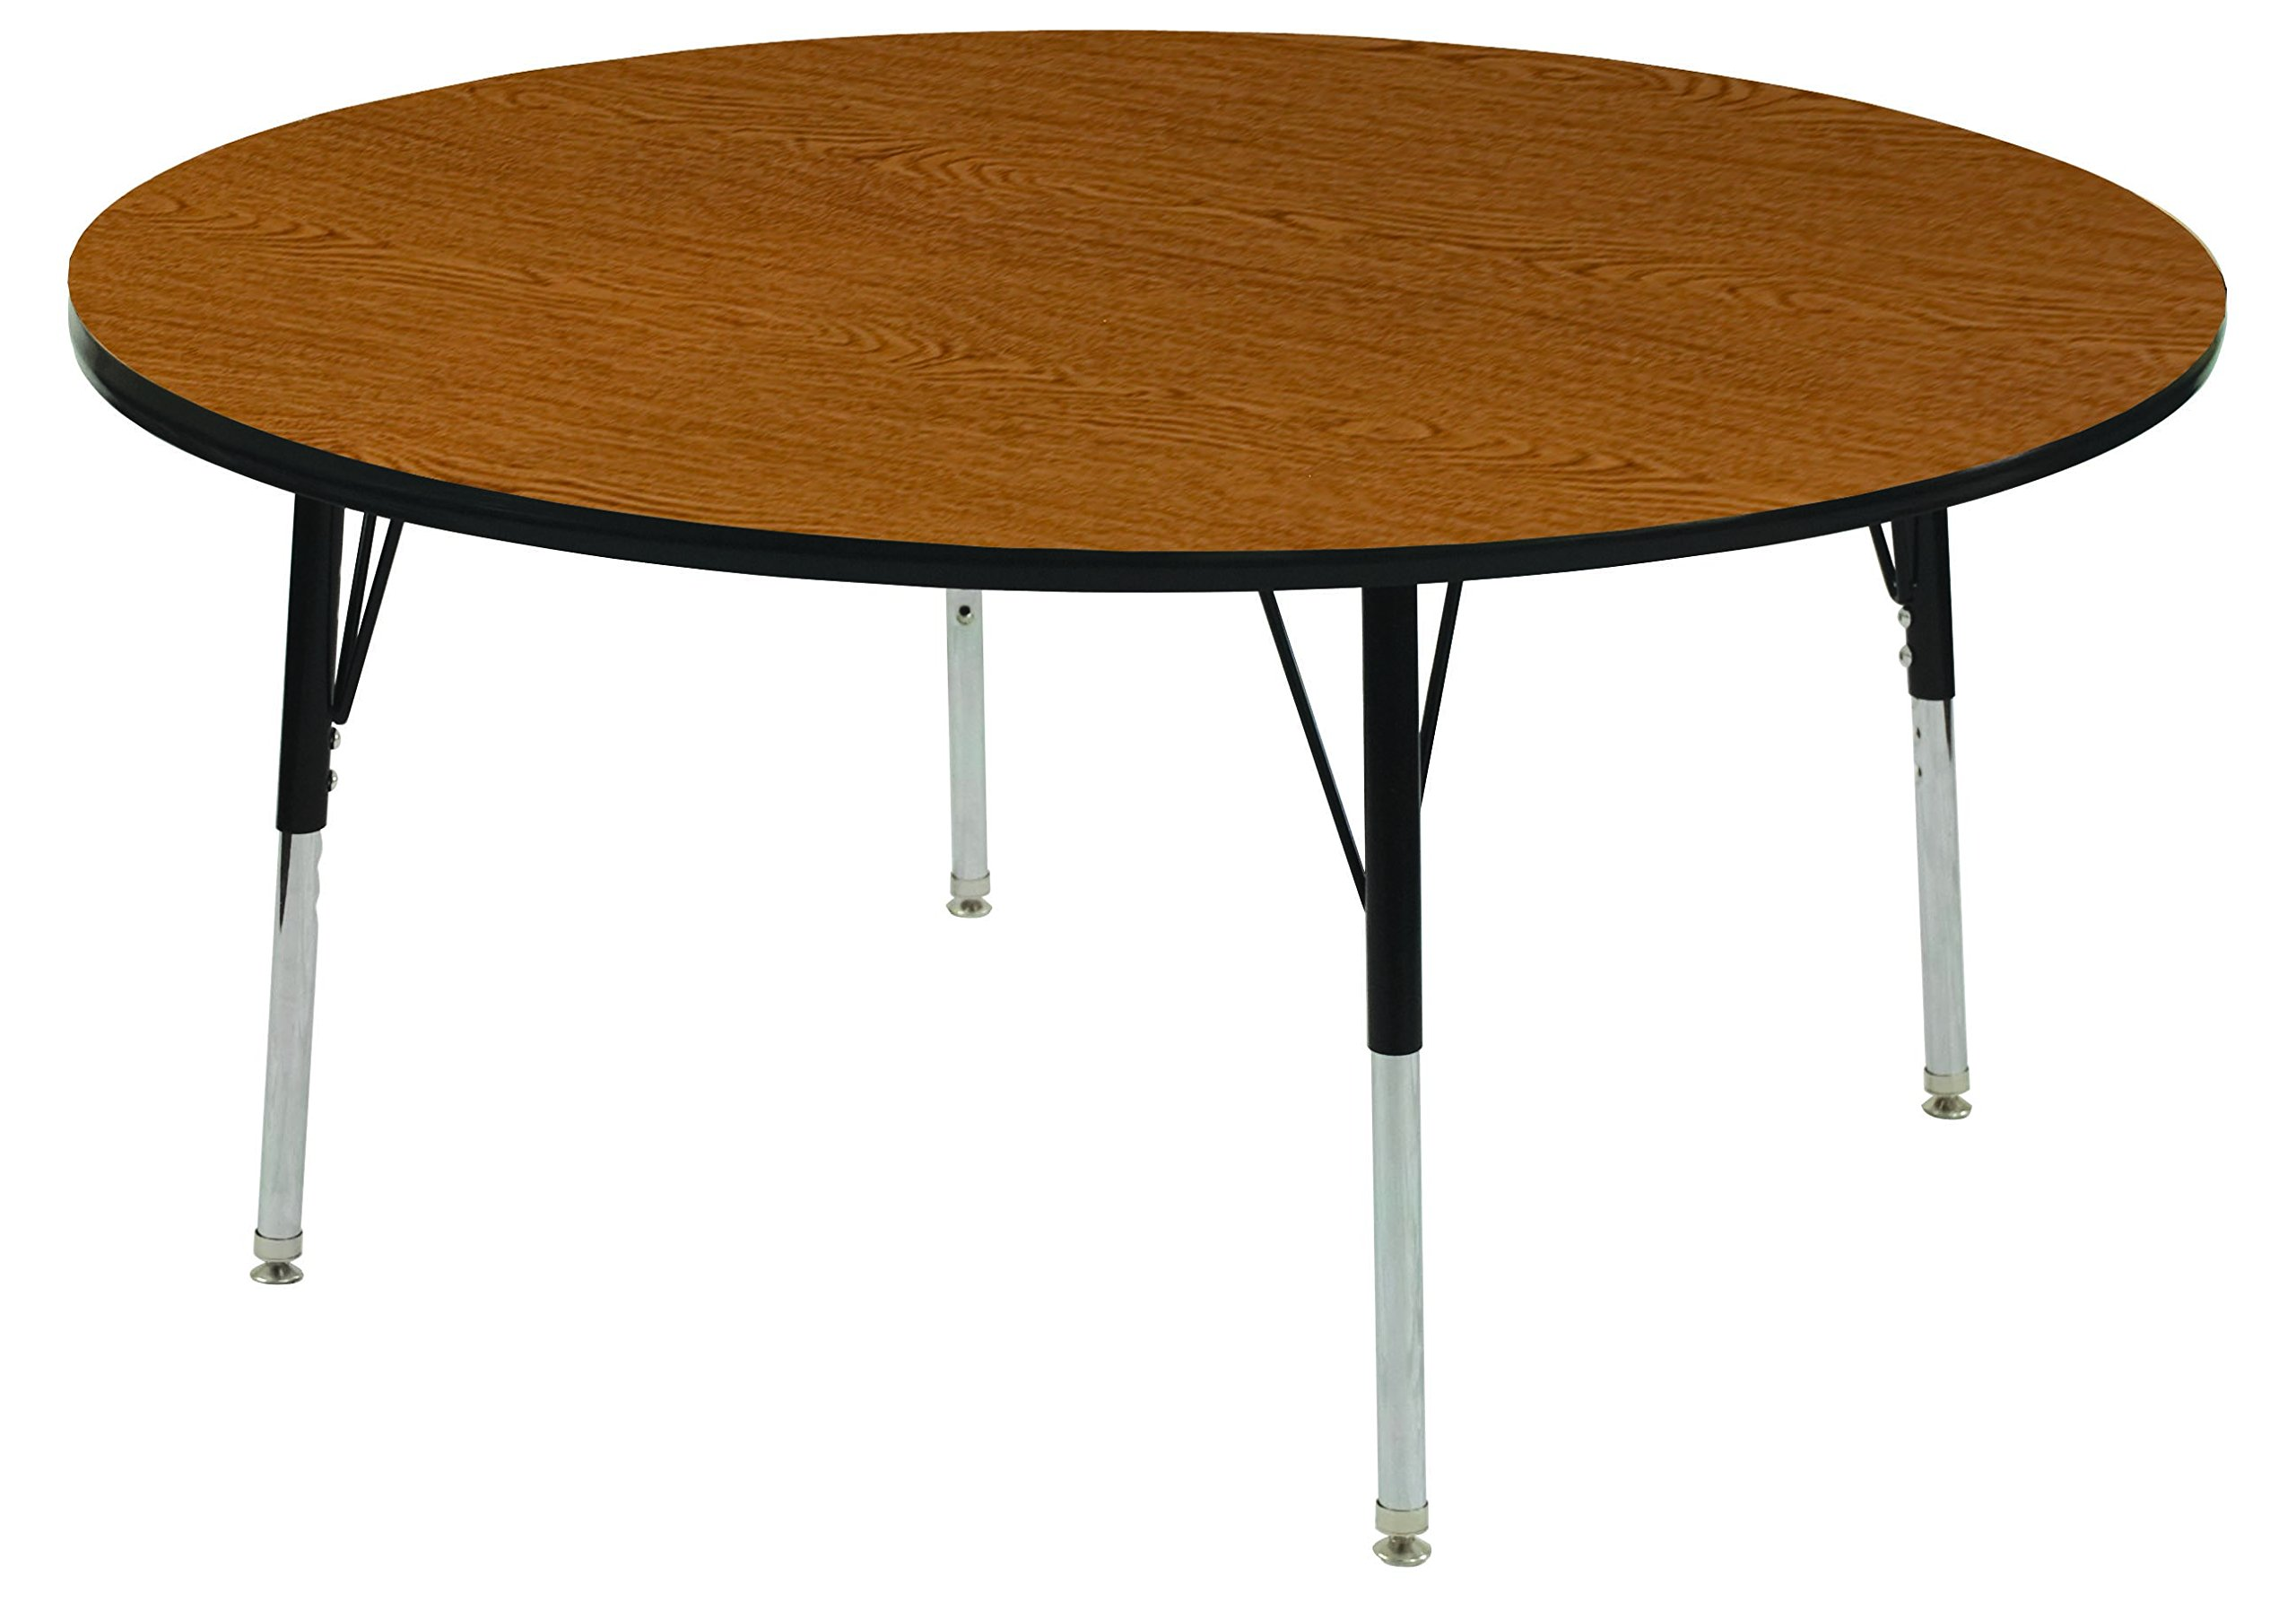 ECR4Kids T-Mold 60'' Round Activity School Table, Standard Legs w/ Swivel Glides, Adjustable Height 19-30 inch (Oak/Black)